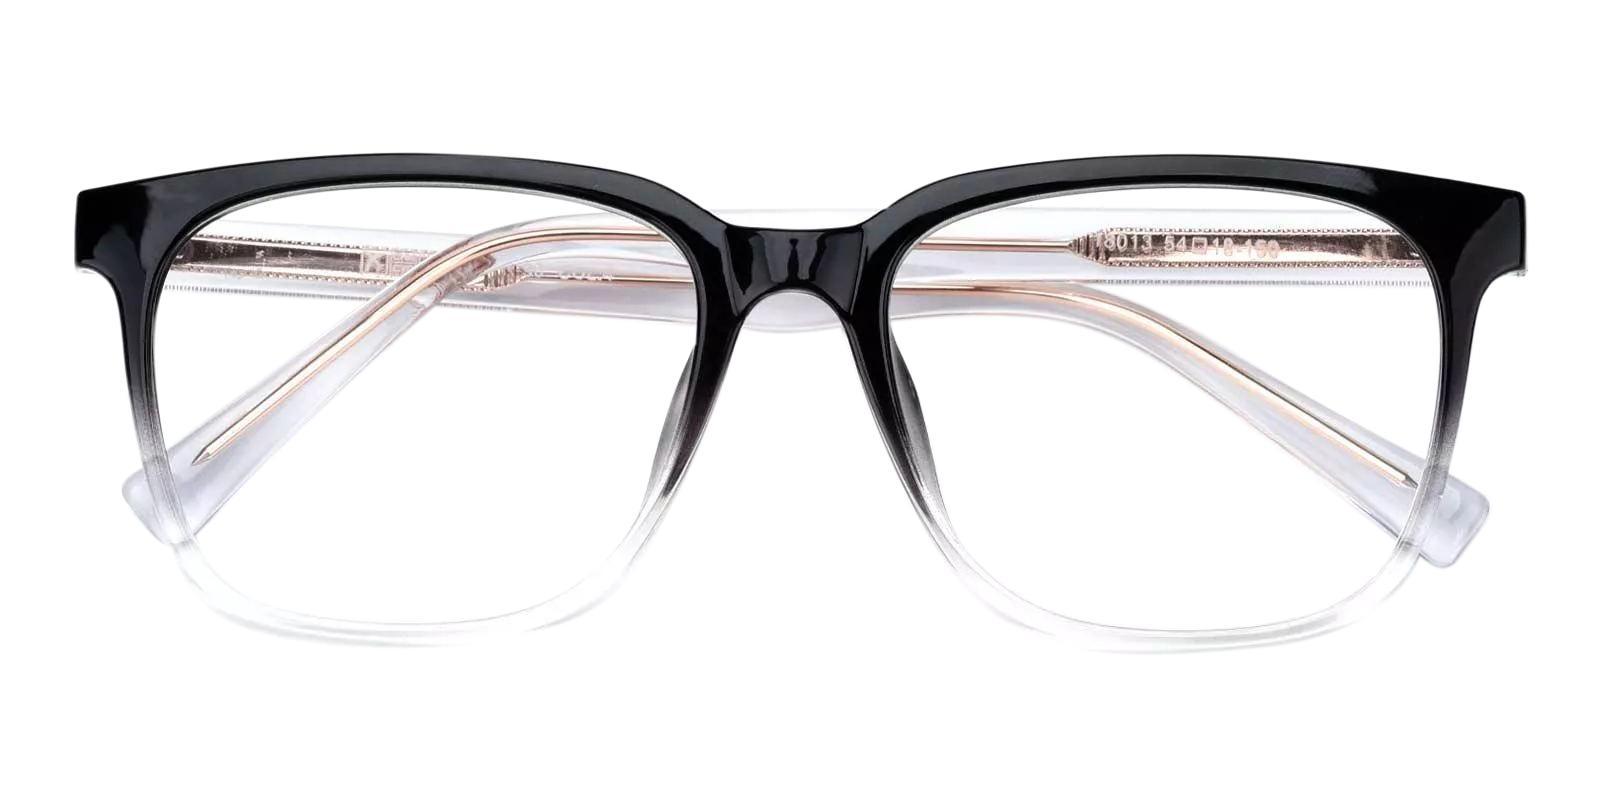 Gaston Black TR Eyeglasses , Fashion , UniversalBridgeFit Frames from ABBE Glasses